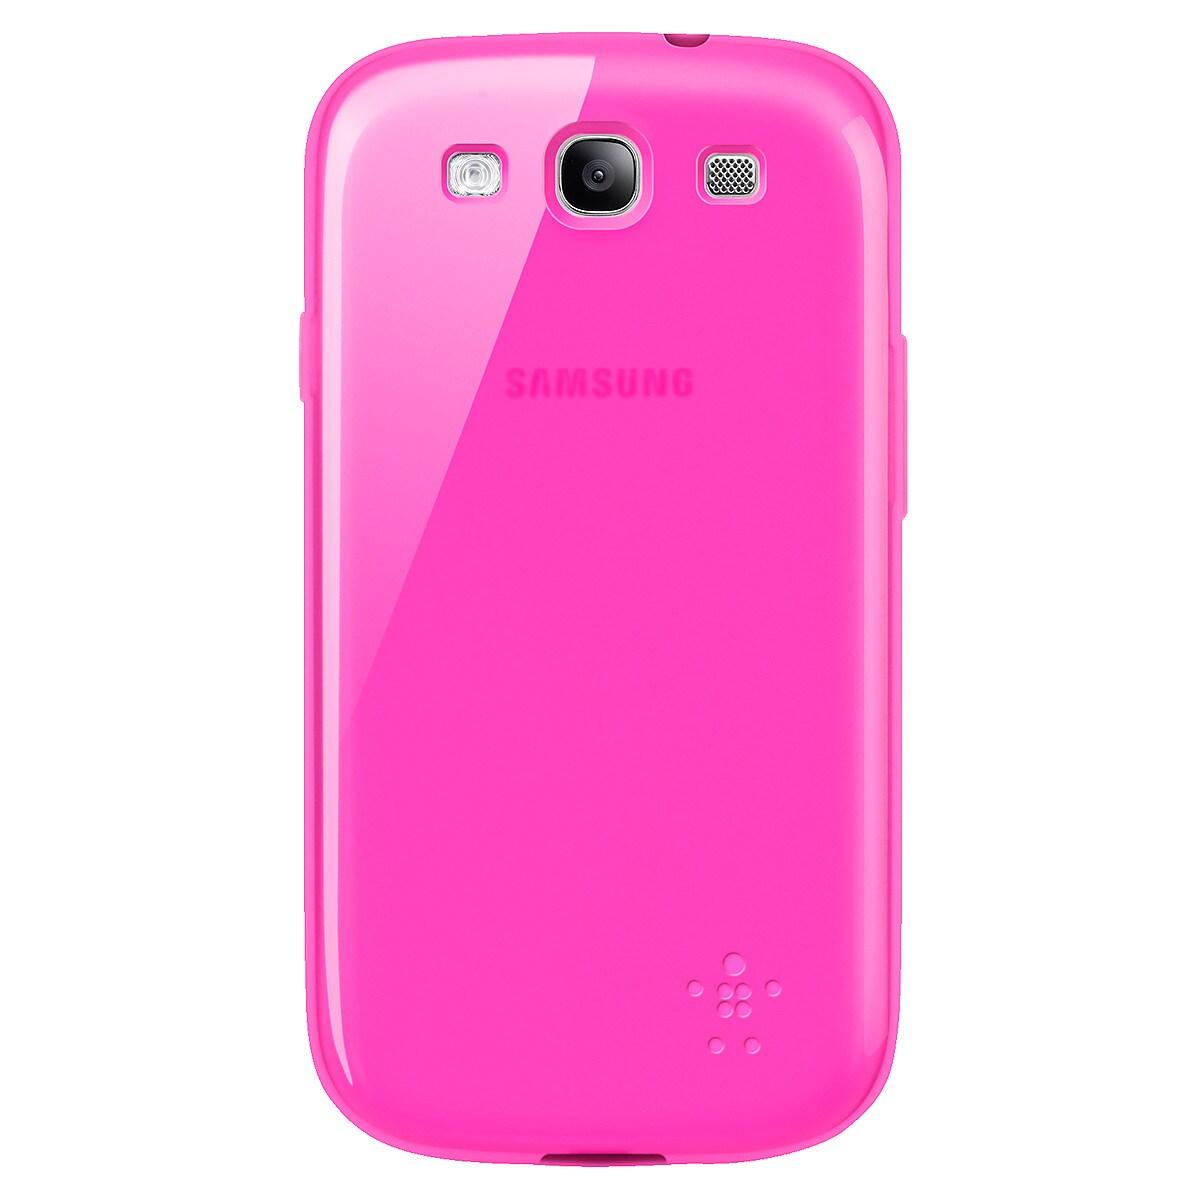 Belkin Grip Sheer Case for Samsung Galaxy S3